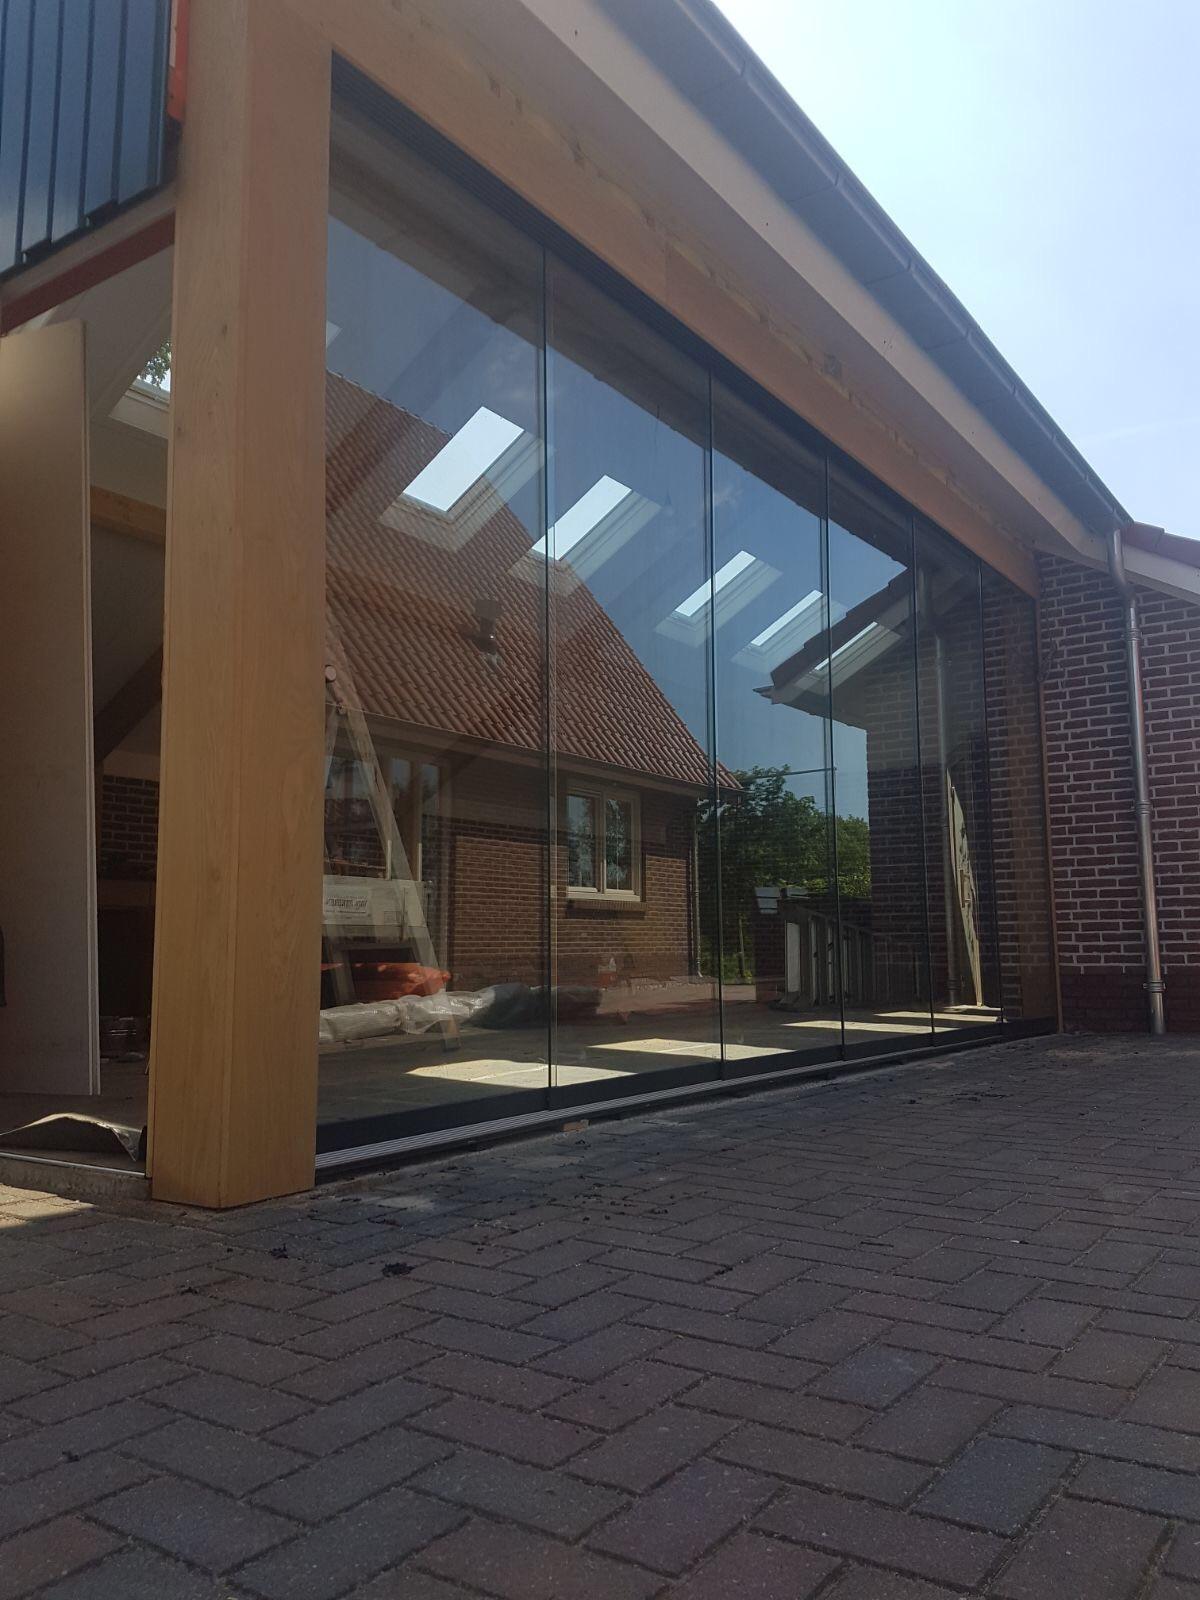 Alufox Schuifwanden Glas Hout schuin dak